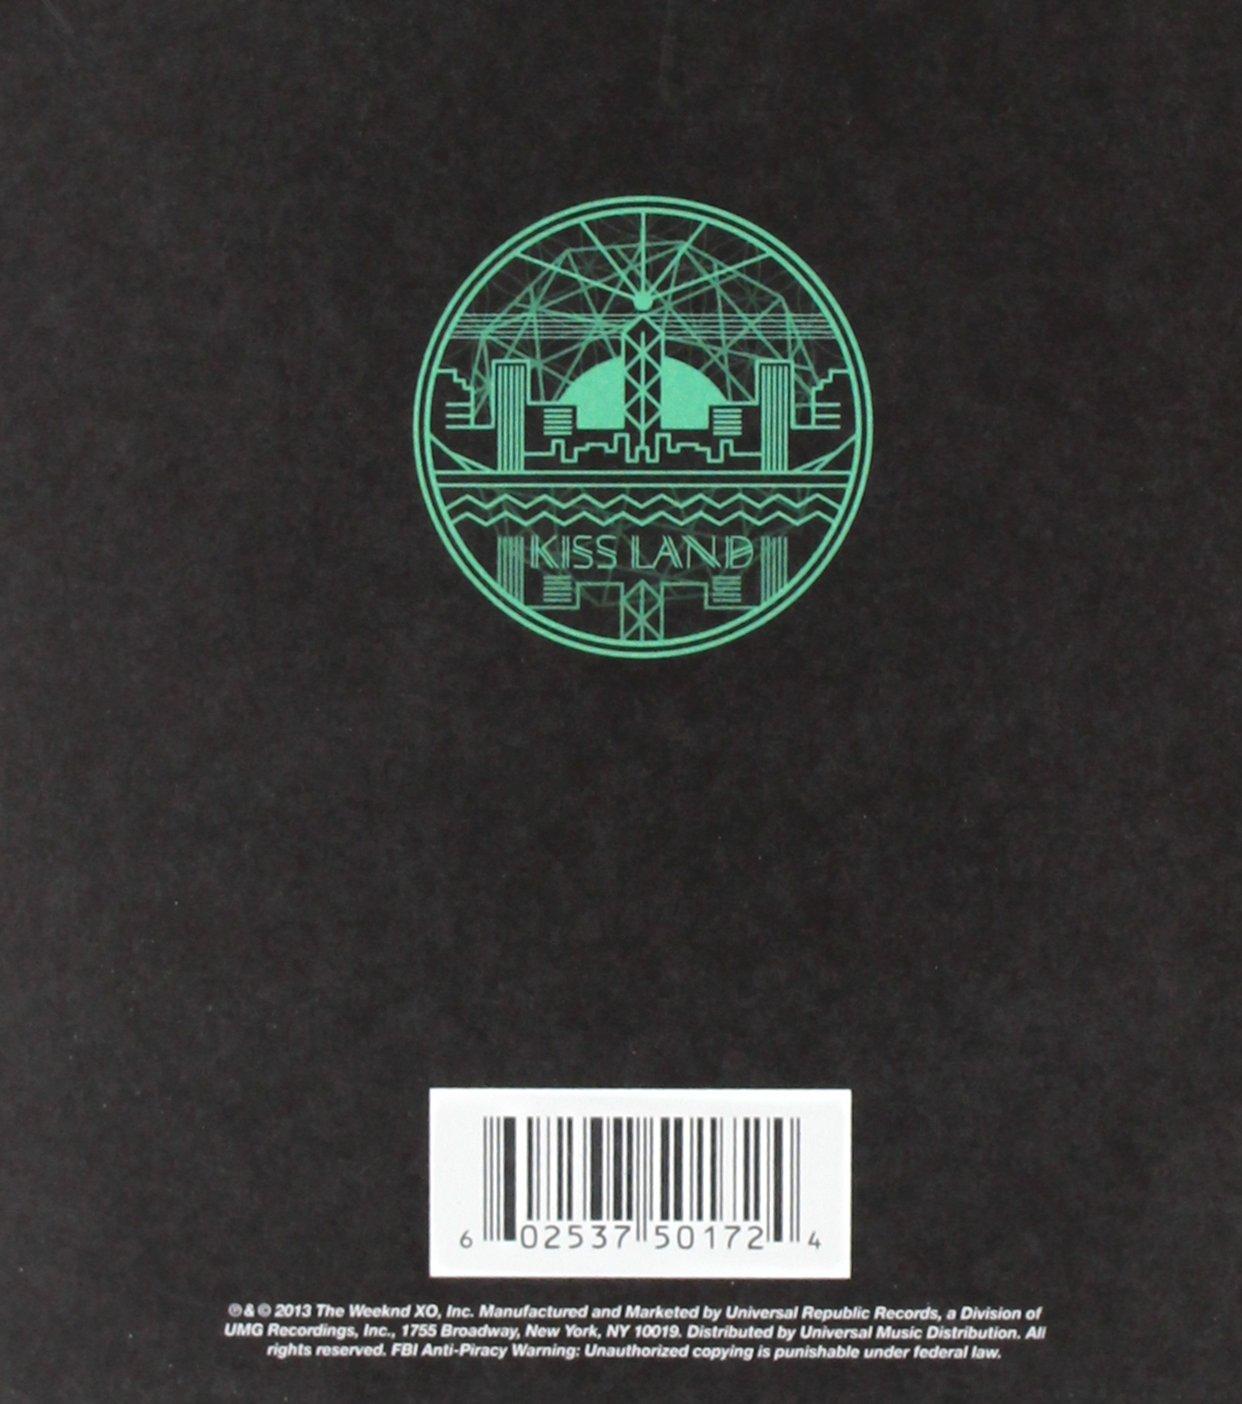 Kiss Land Album Songs